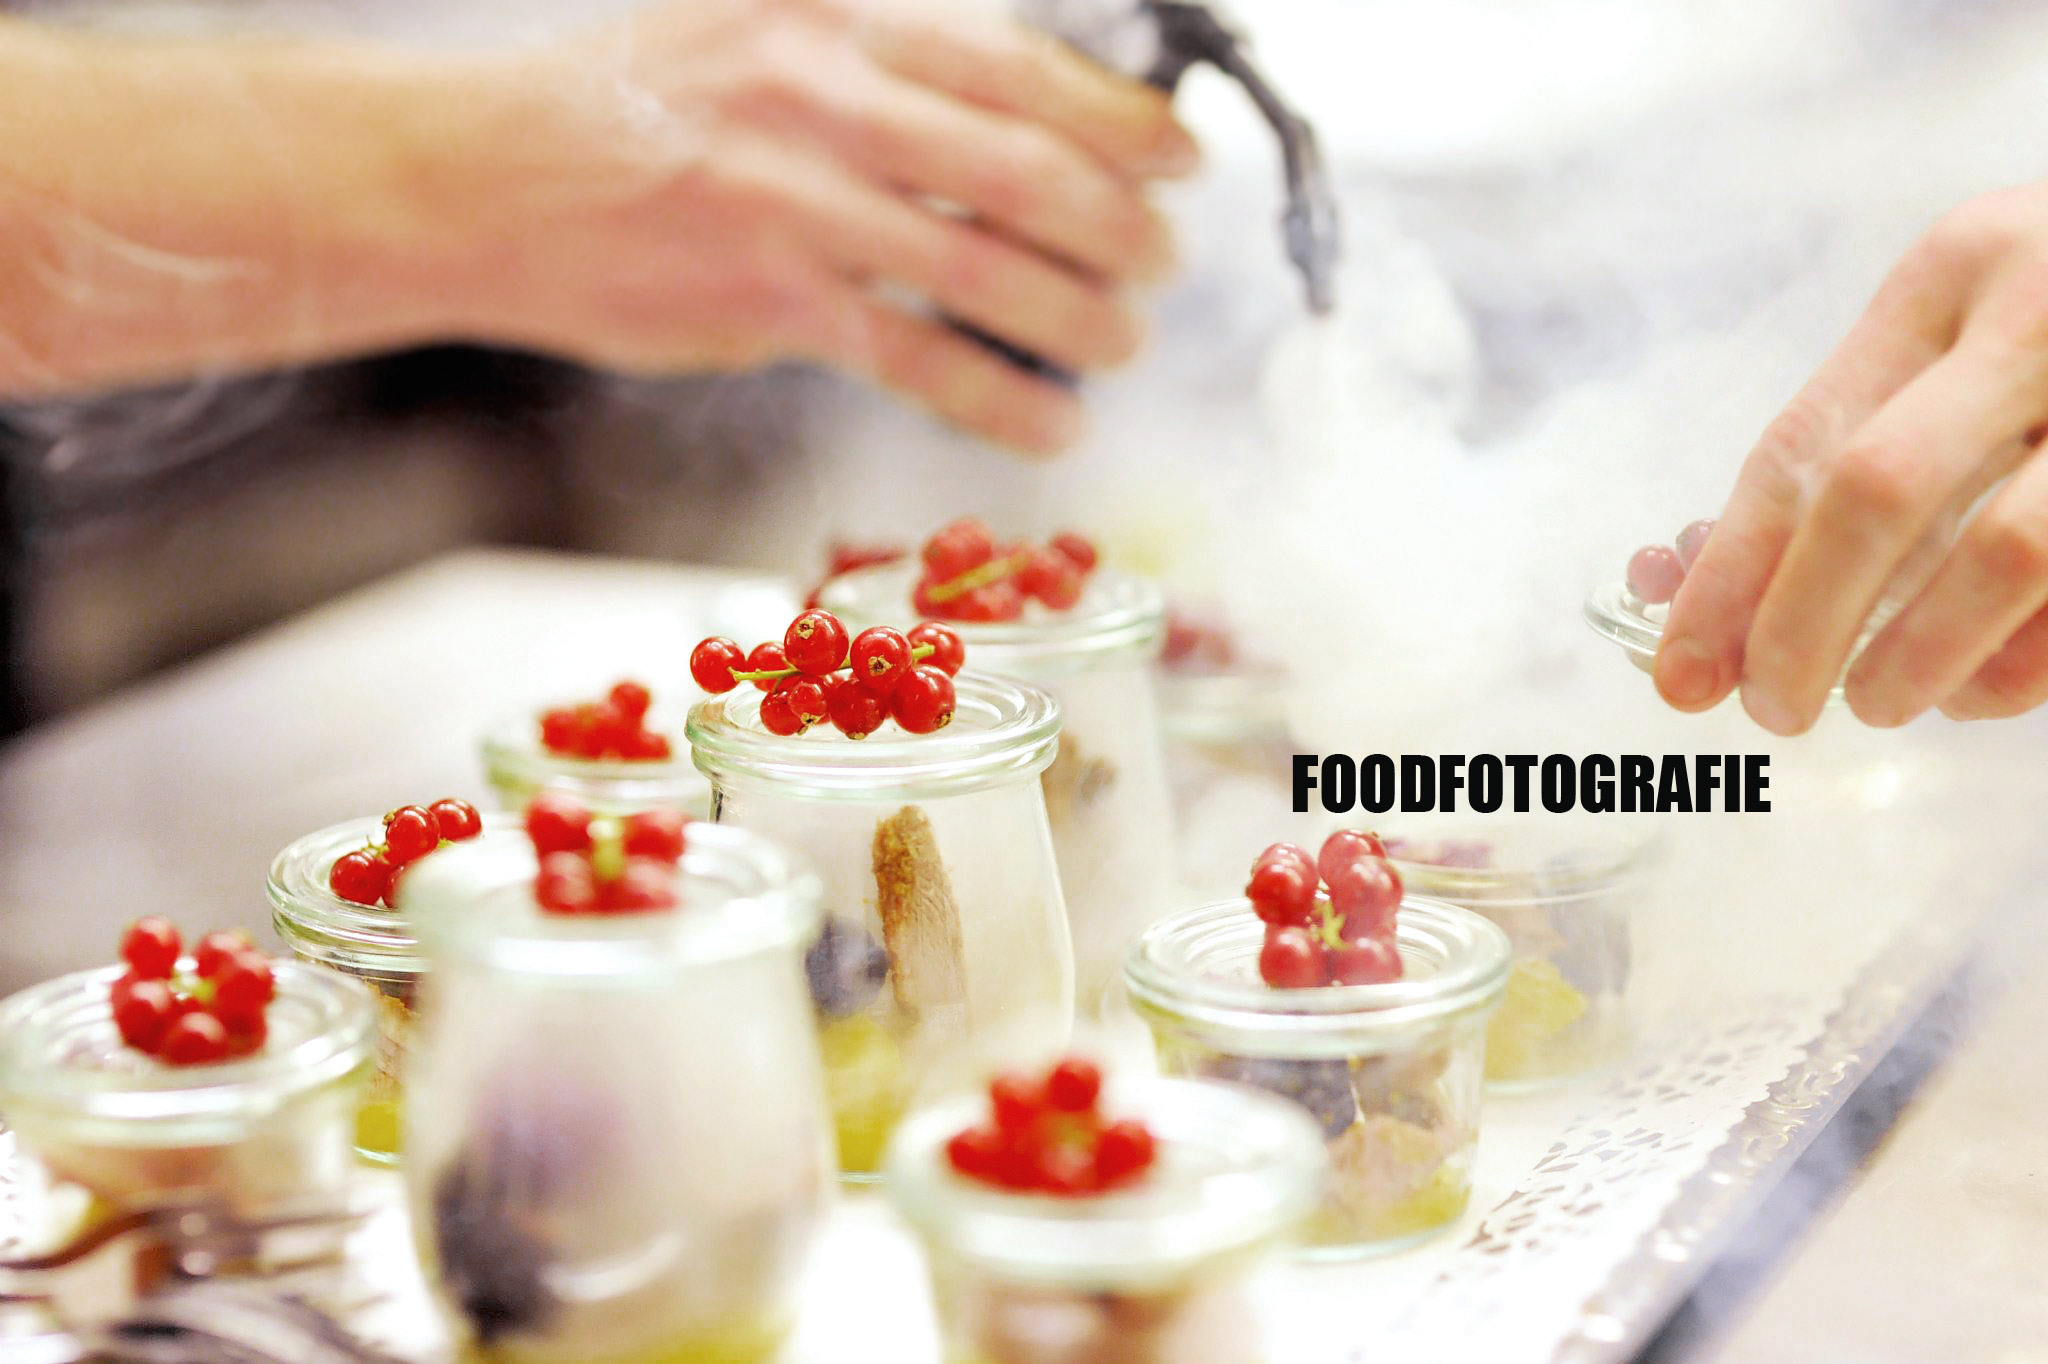 nicole-bouillon-fotografie-foodfotografie-koblenz